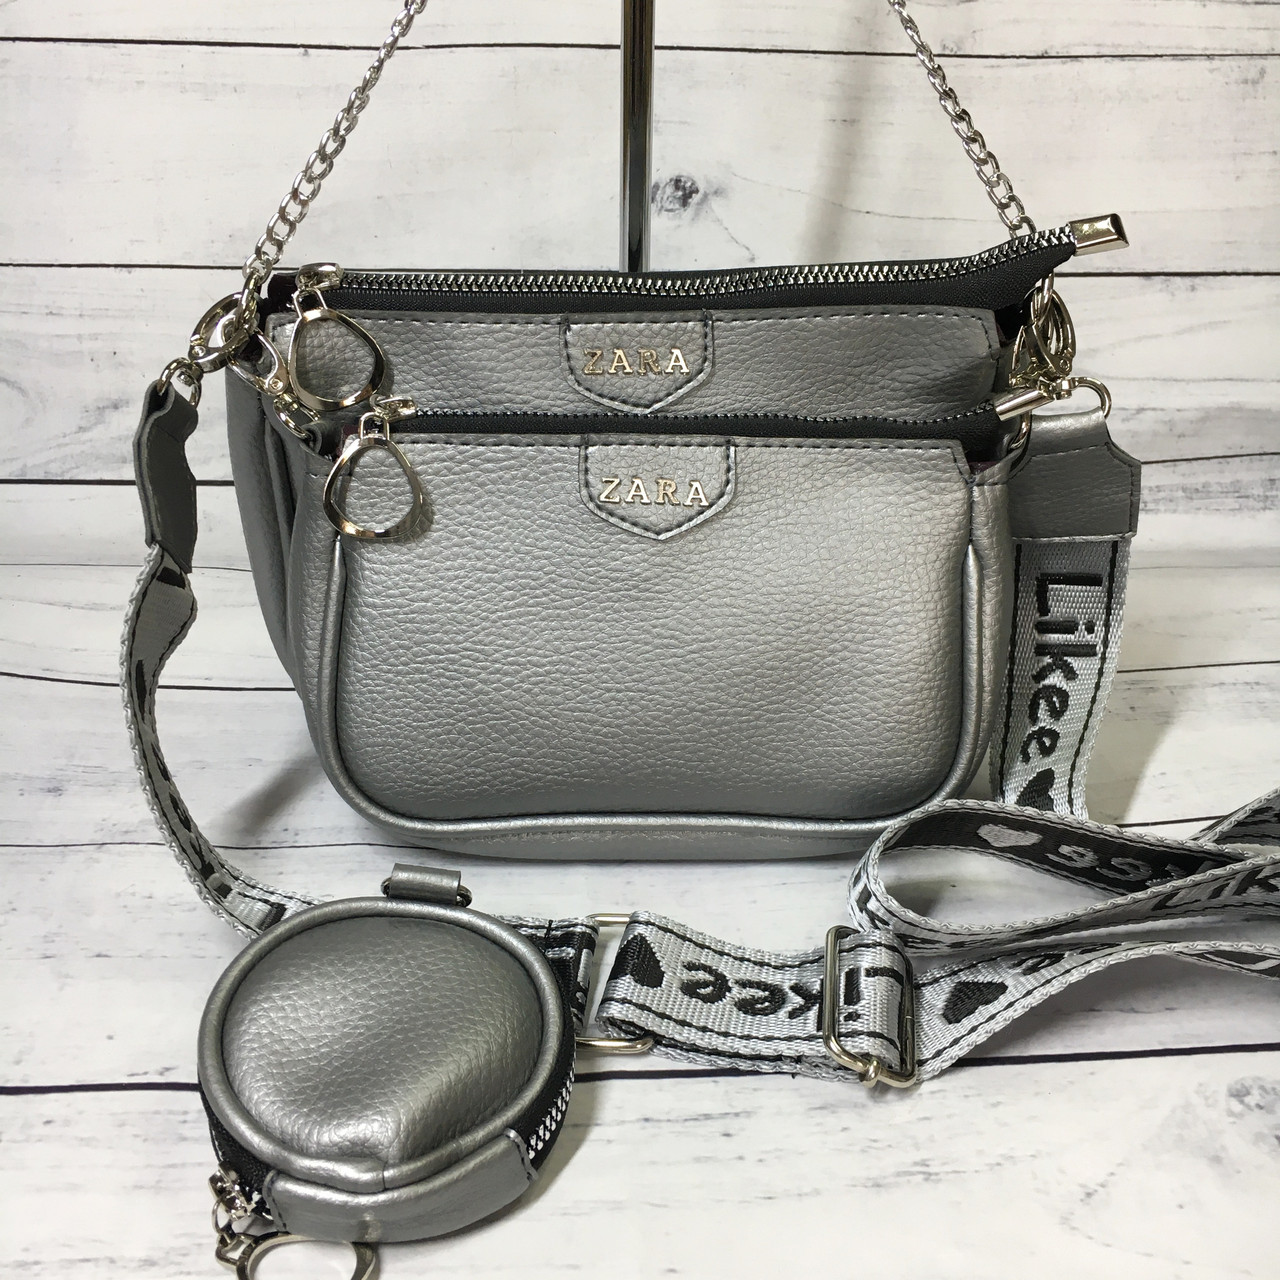 Женская сумка Zara (Зара), серебристая ( код: IBG214S )